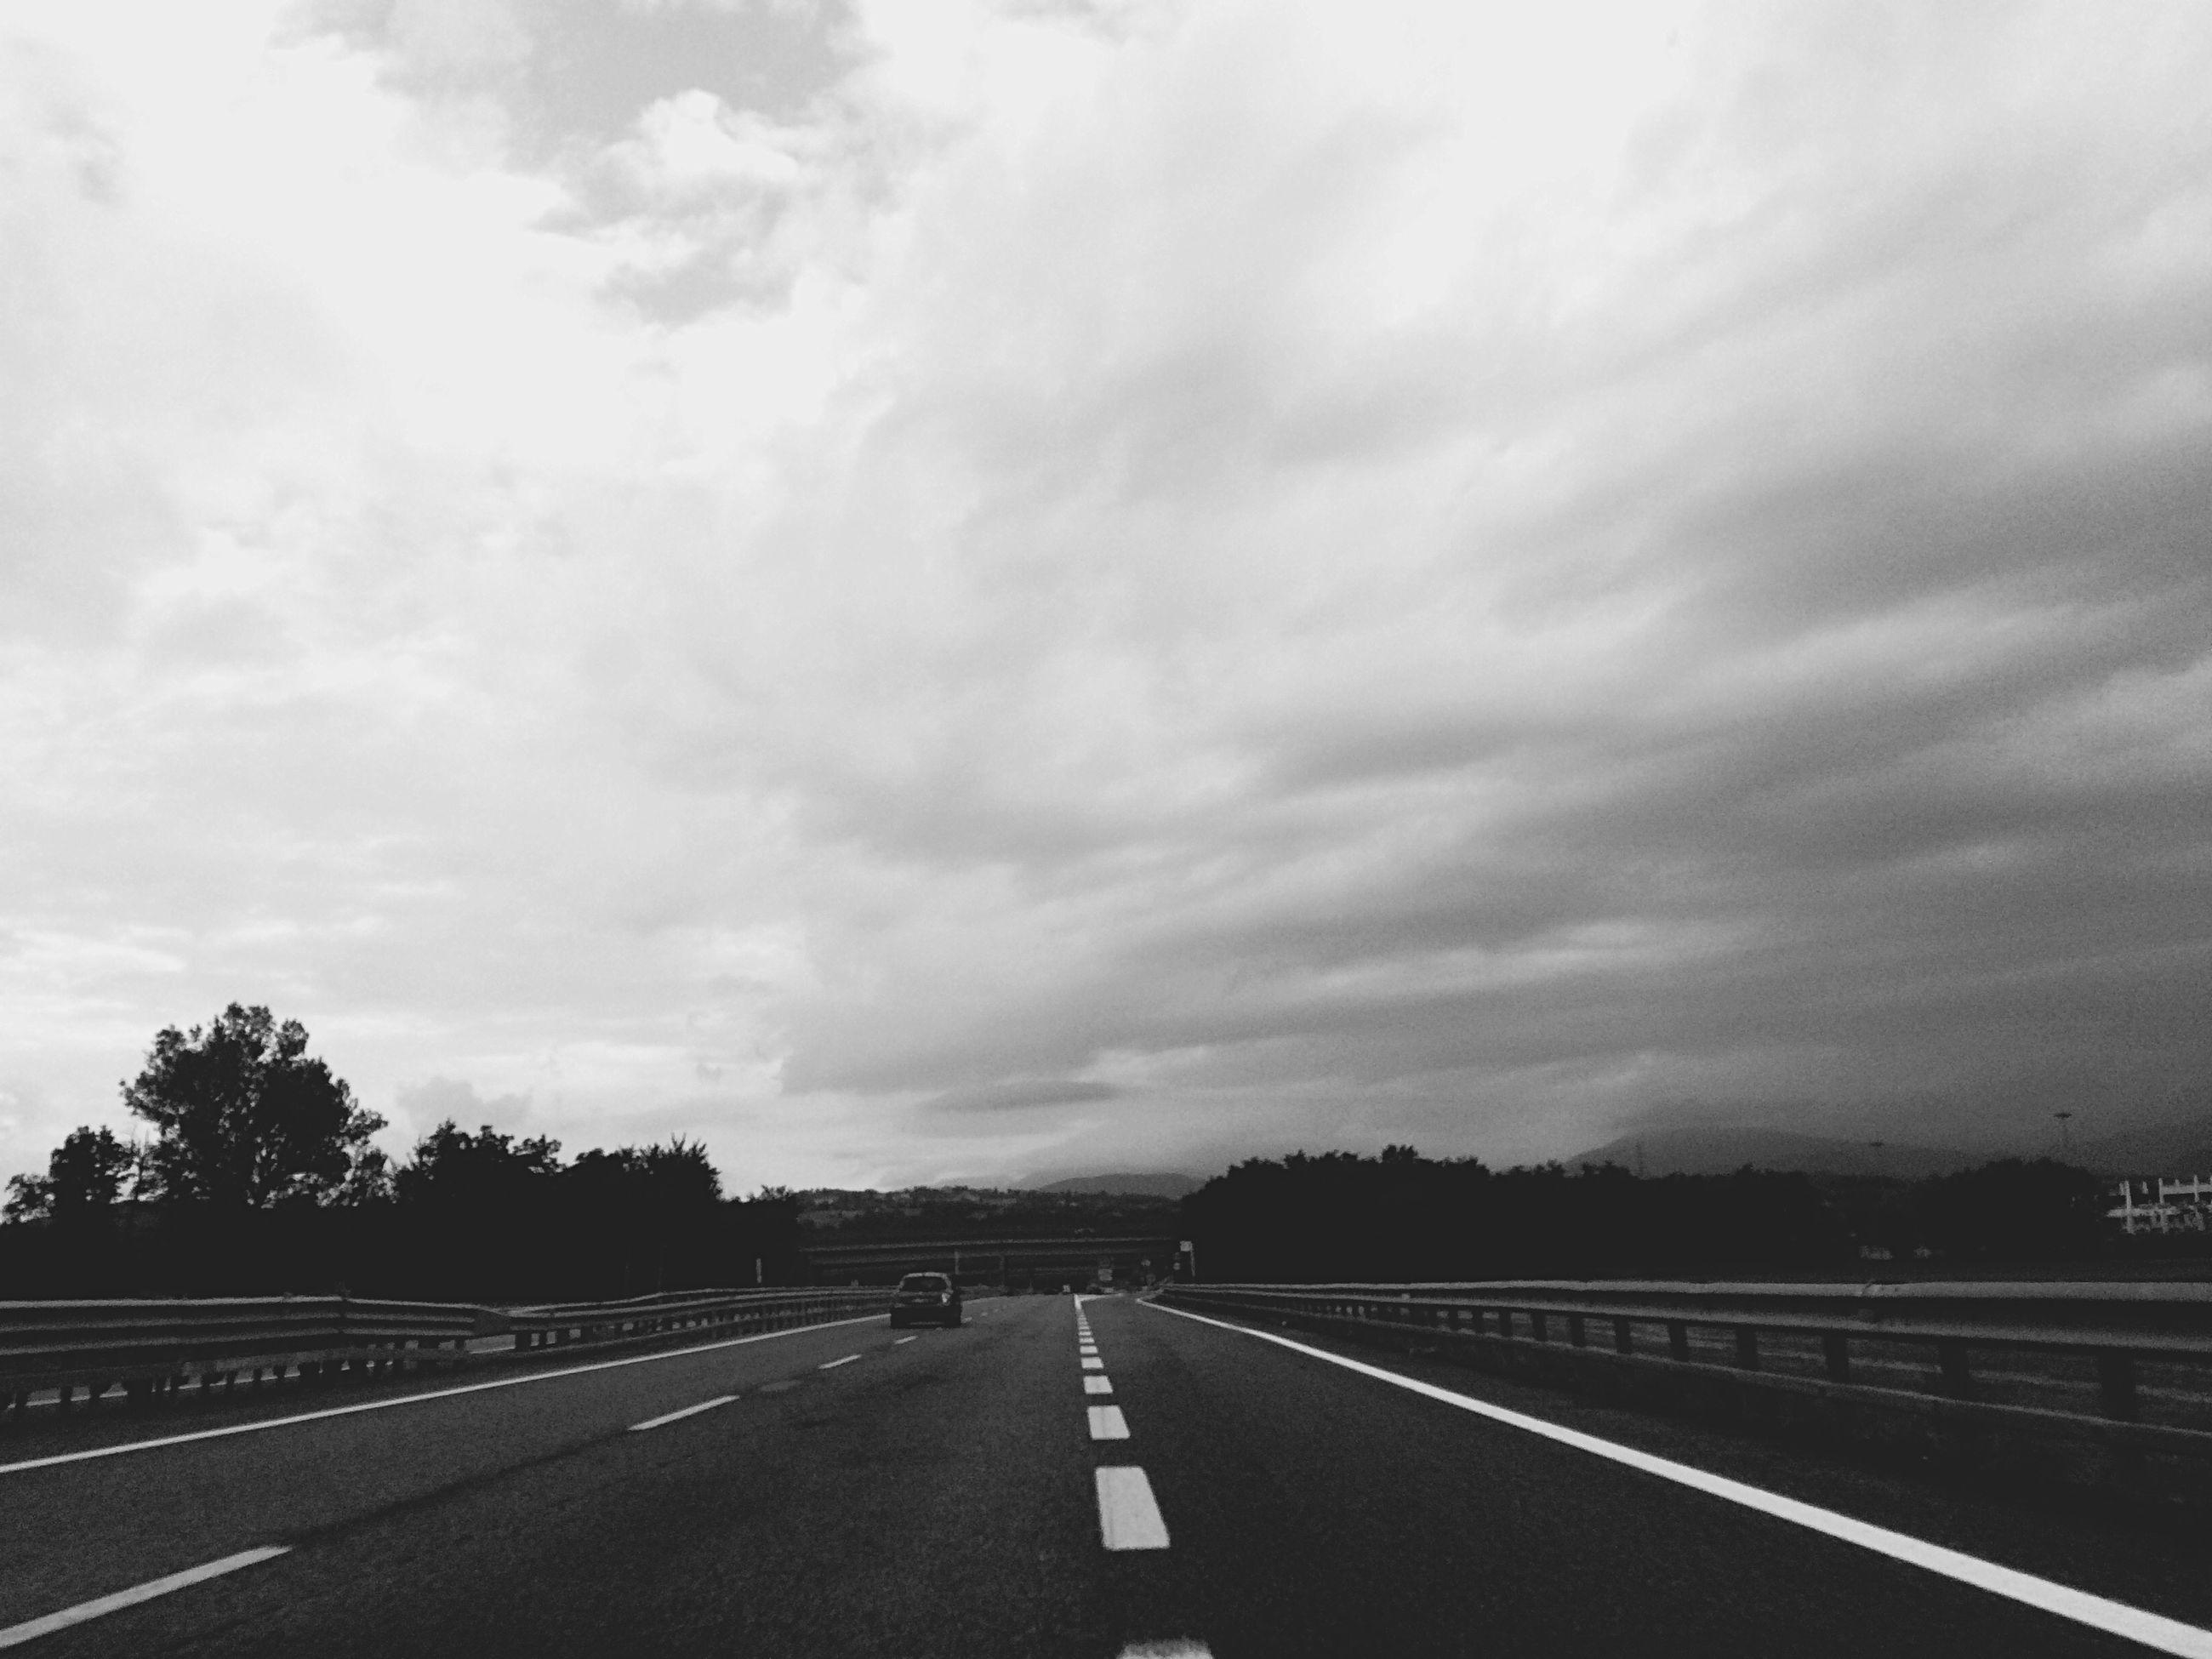 the way forward, road, transportation, sky, diminishing perspective, road marking, vanishing point, cloud - sky, cloudy, country road, empty road, empty, cloud, landscape, street, asphalt, overcast, tranquility, nature, tranquil scene